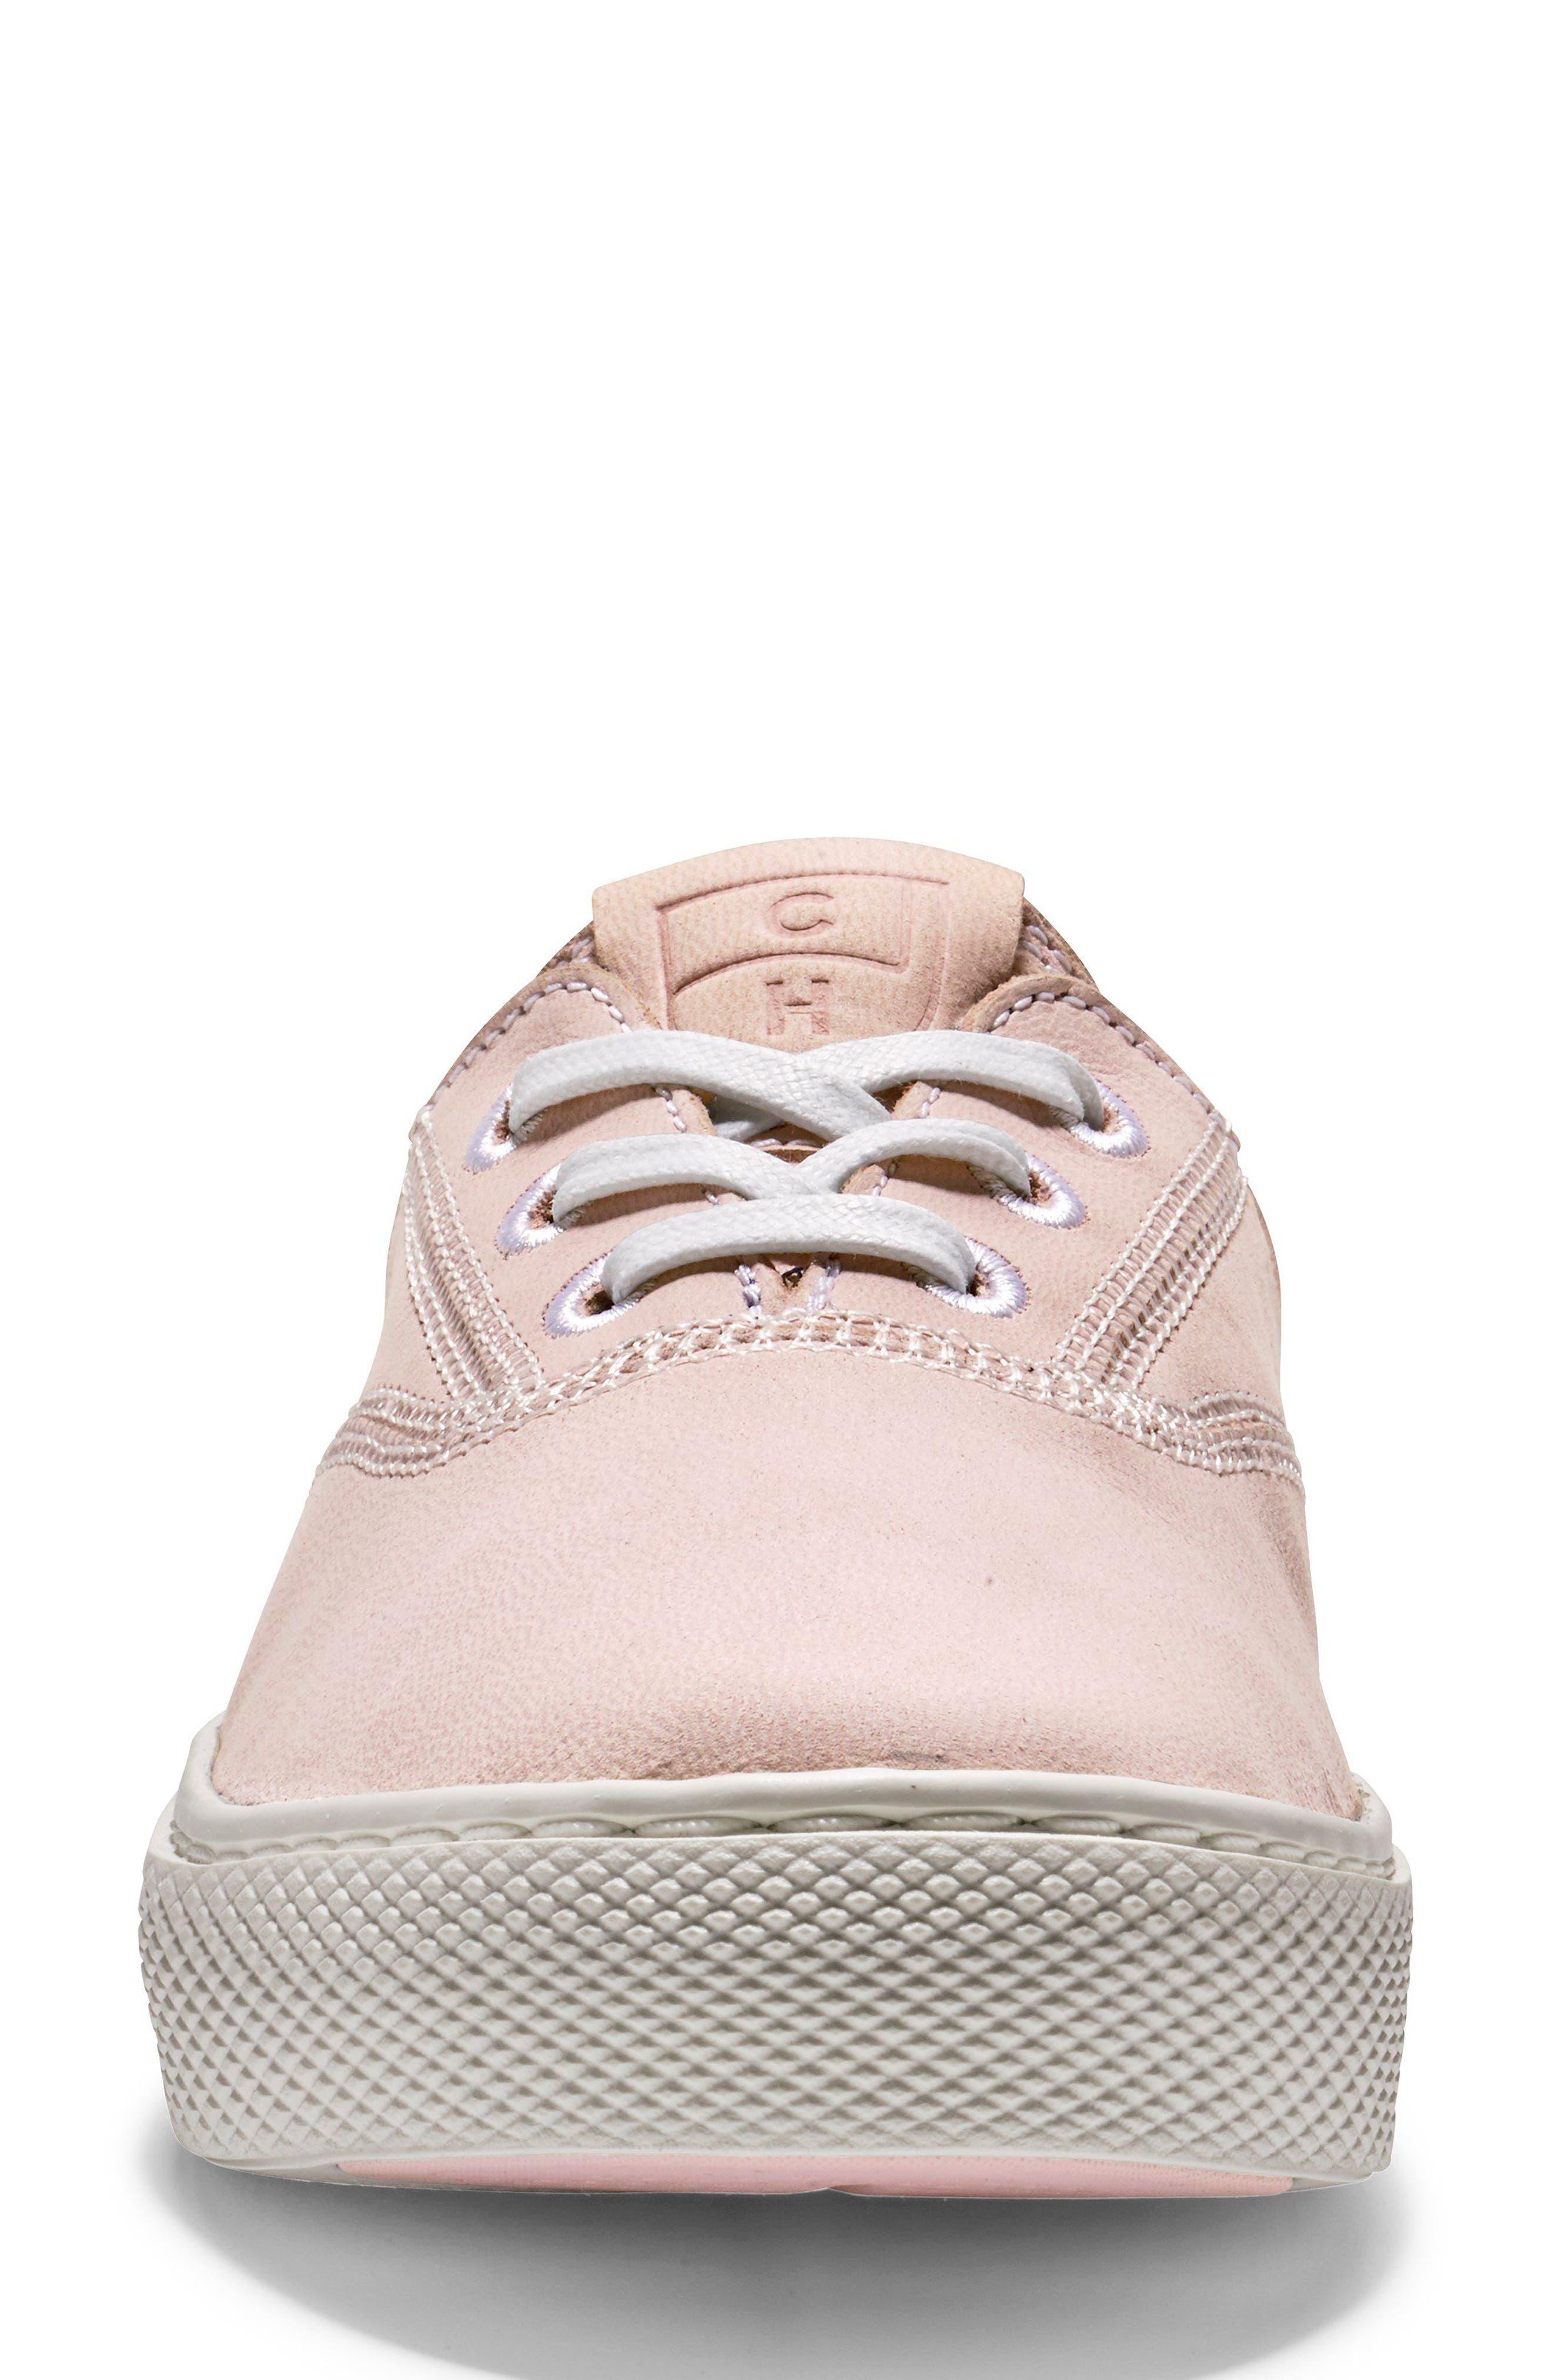 GrandPro Deck Sneaker,                             Alternate thumbnail 4, color,                             PETAL/ OPTIC WHITE NUBUCK